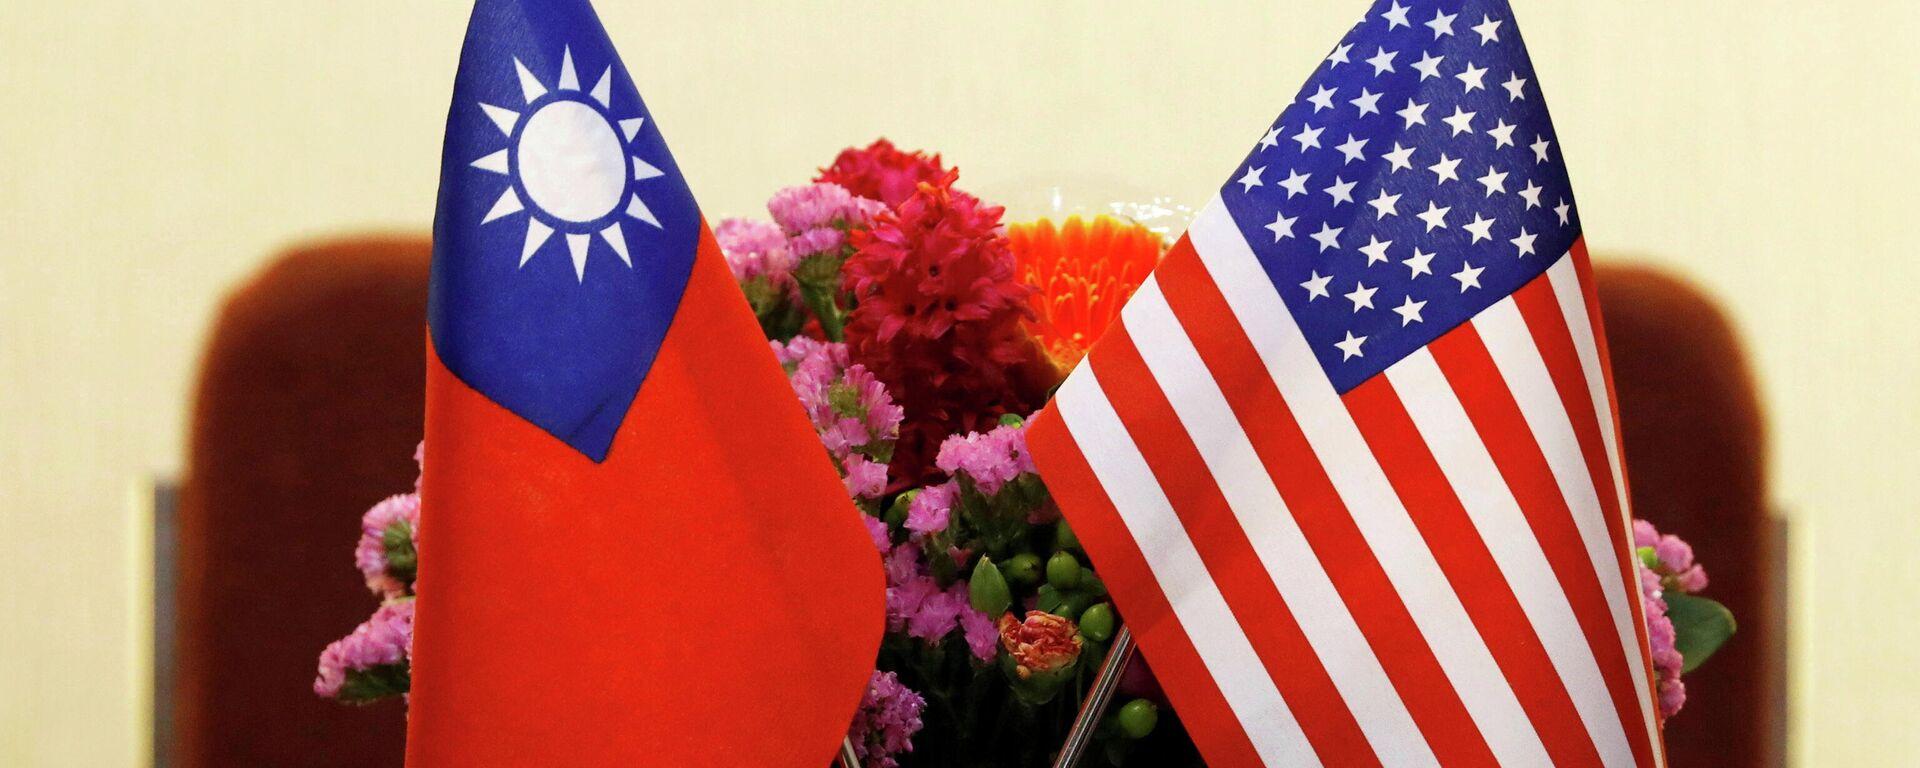 Bandiere di Taiwan e USA - Sputnik Italia, 1920, 08.07.2021